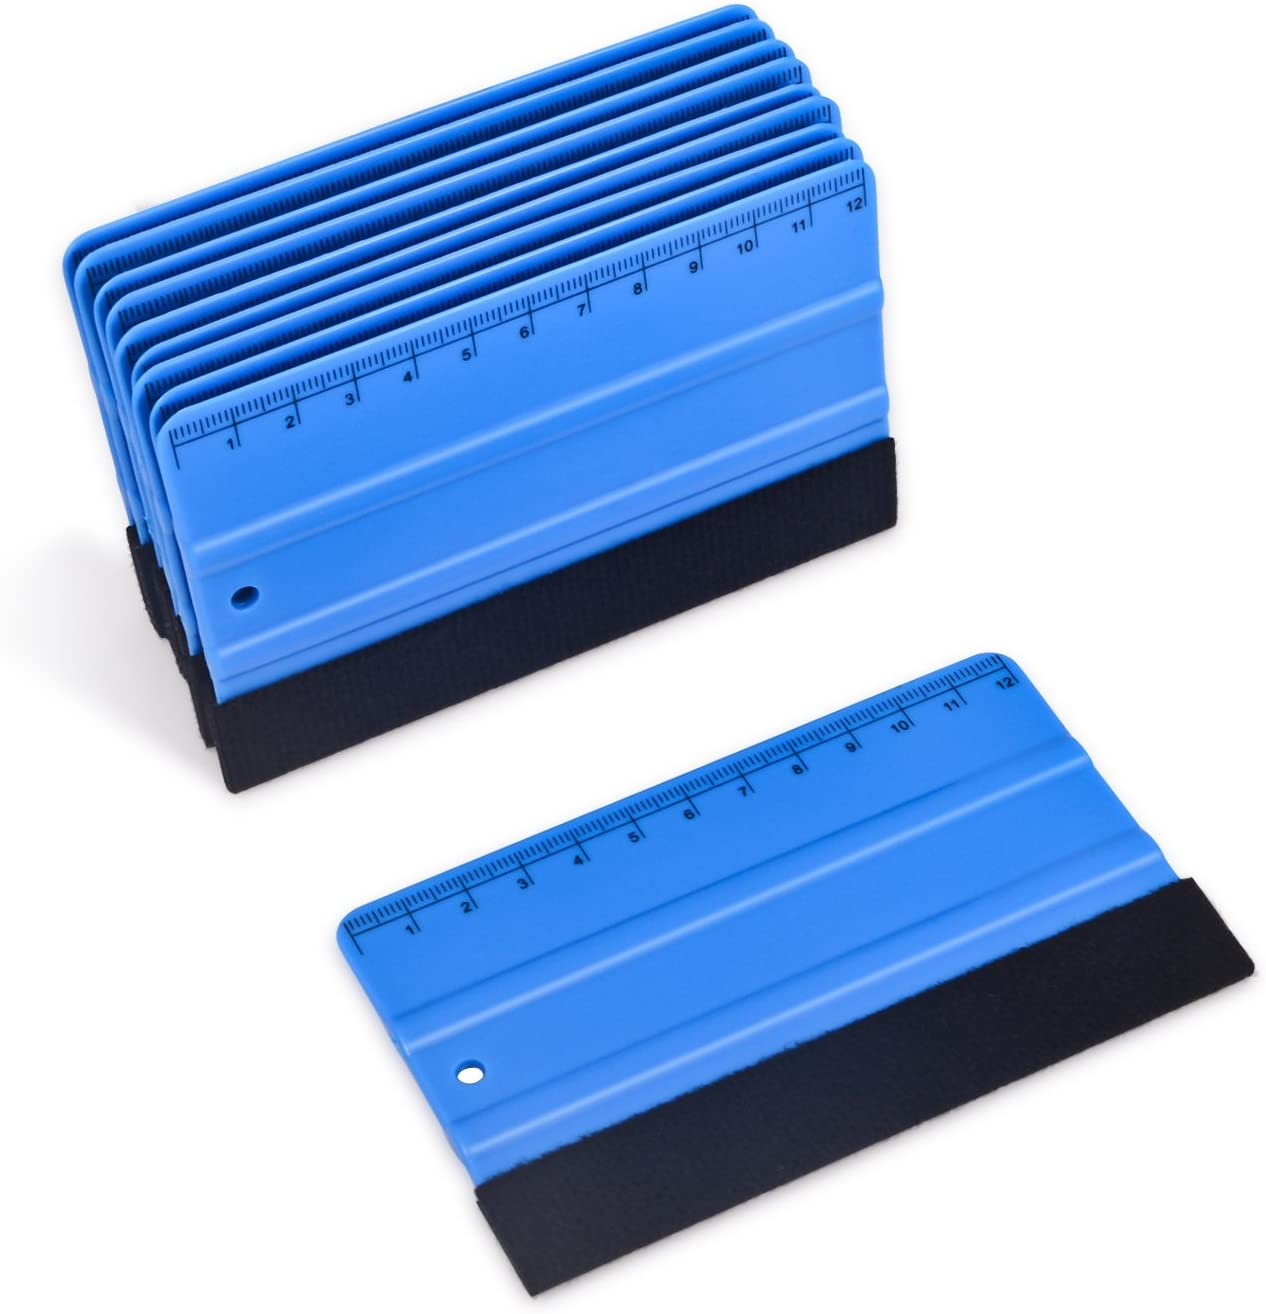 Winjun 10 Stück Blau Plastik Rakel Filzrakel Folienrakel Verkleberakel Kunststoffrakel Andrückrakel Kantenrakel Mit Lineal Für Auto Vinyl Wrap Fensterfolien Tönungsfolien Auto